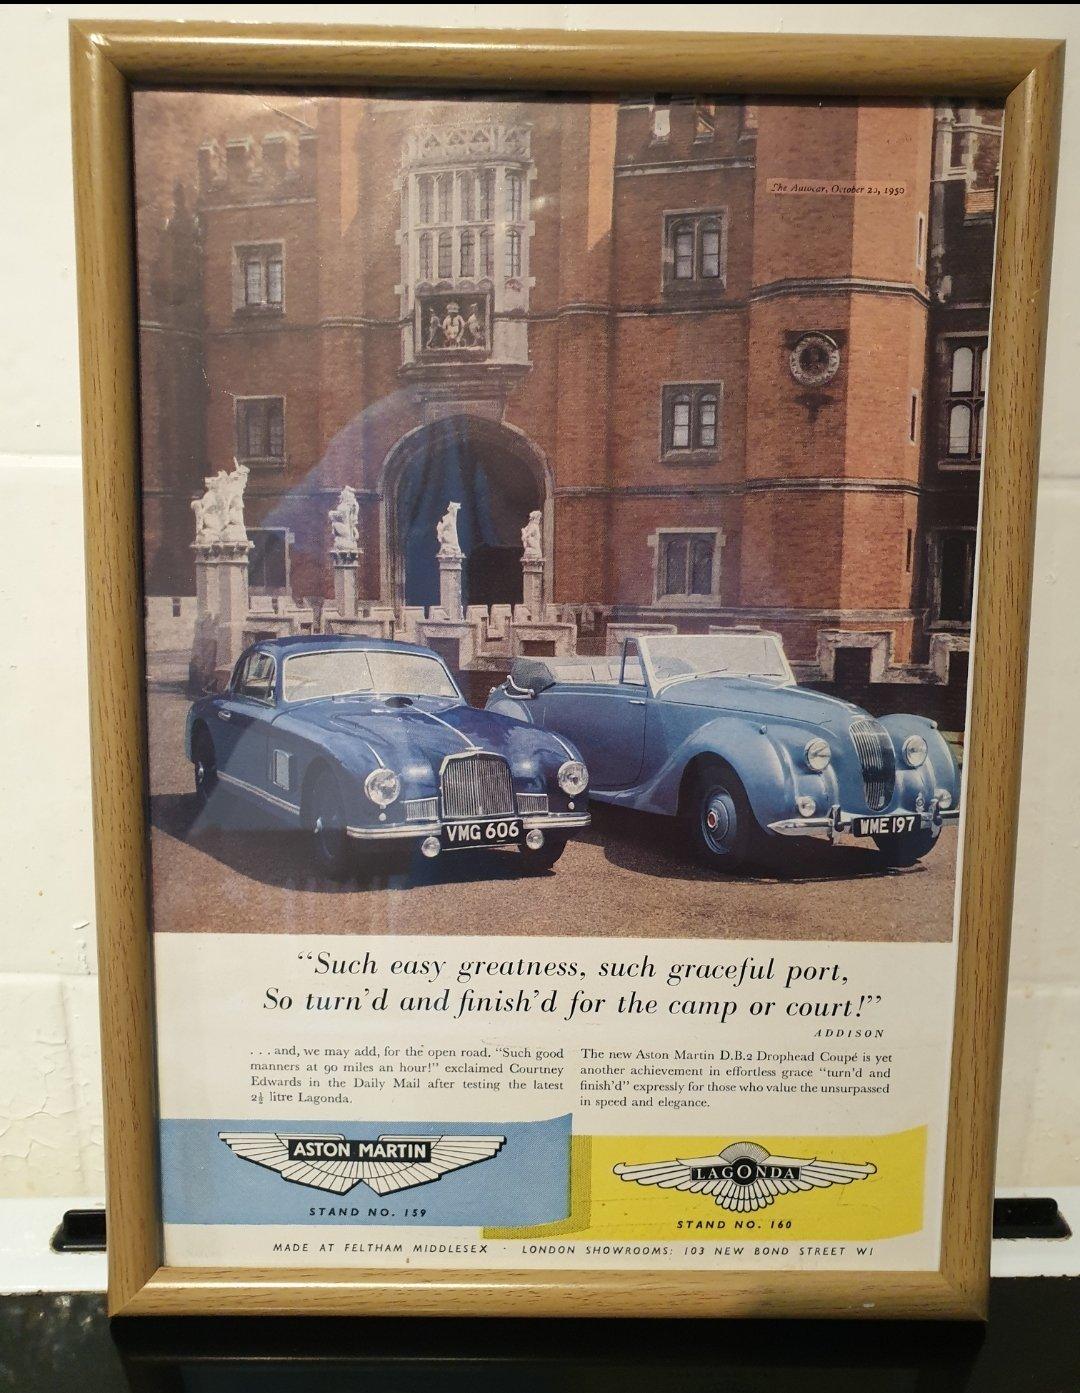 1950 Aston Martin and Lagonda Advert Original  For Sale (picture 1 of 2)